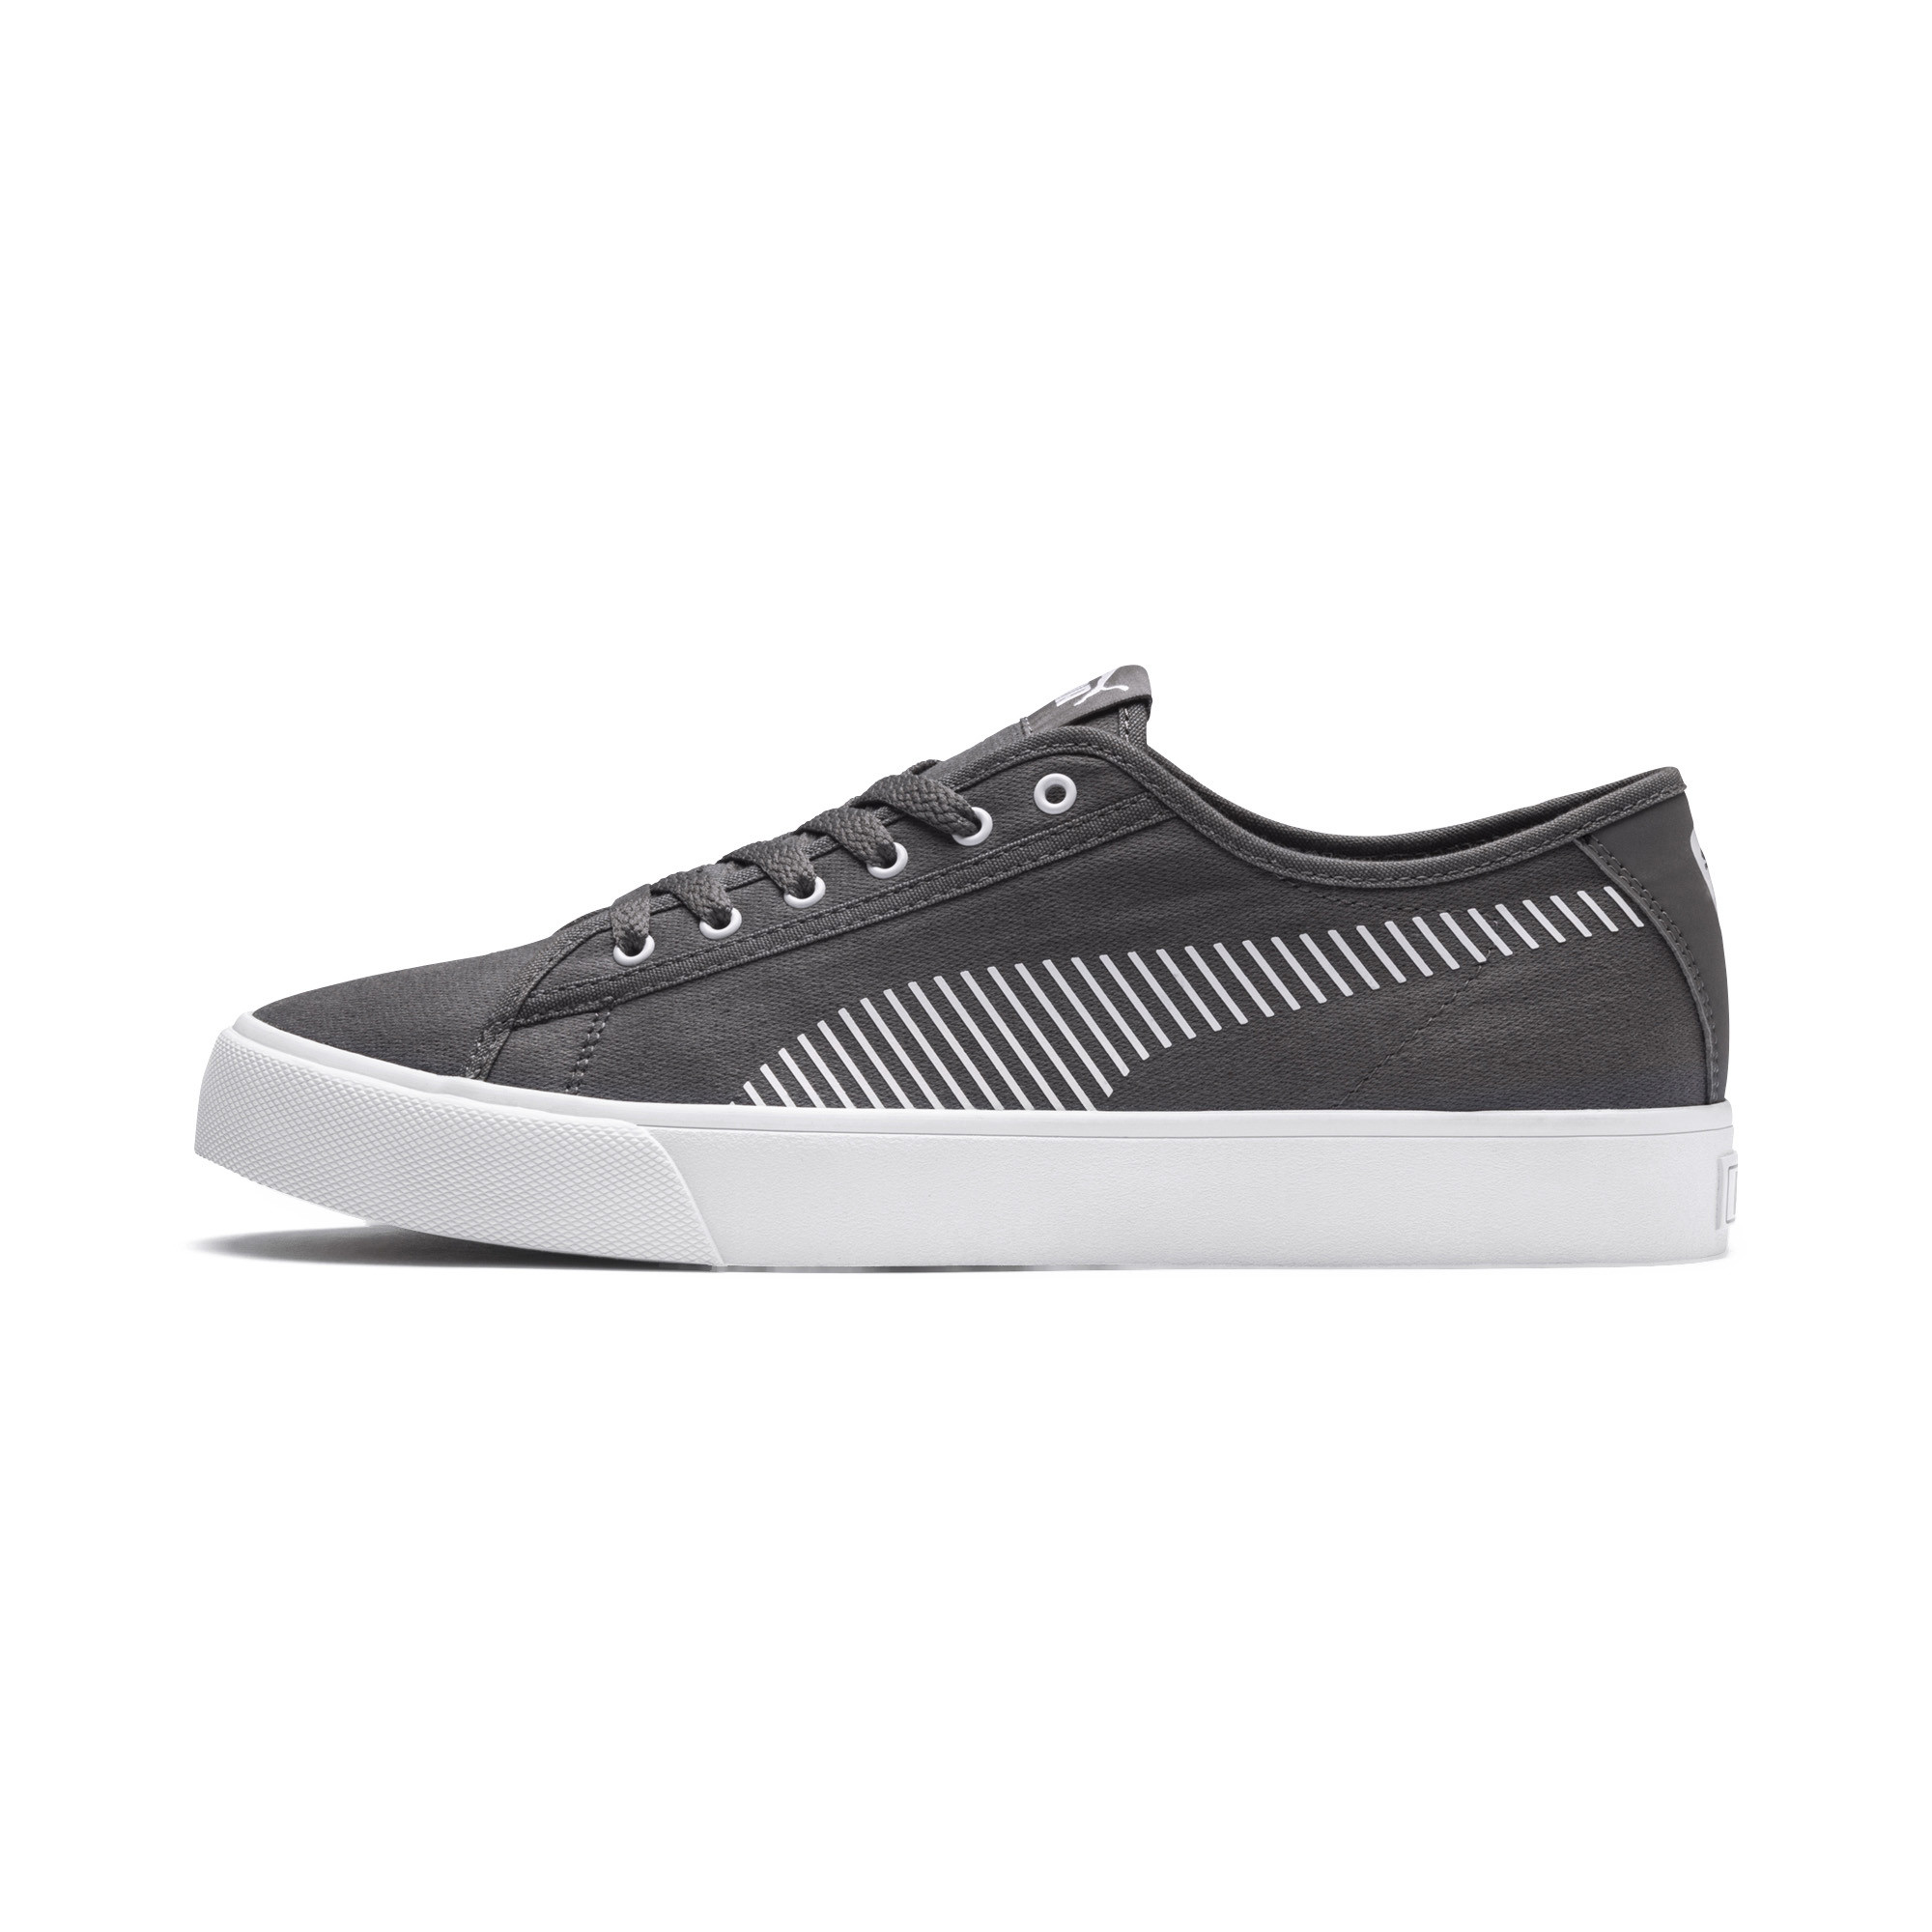 PUMA-Bari-Sneakers-Men-Shoe-Basics thumbnail 19